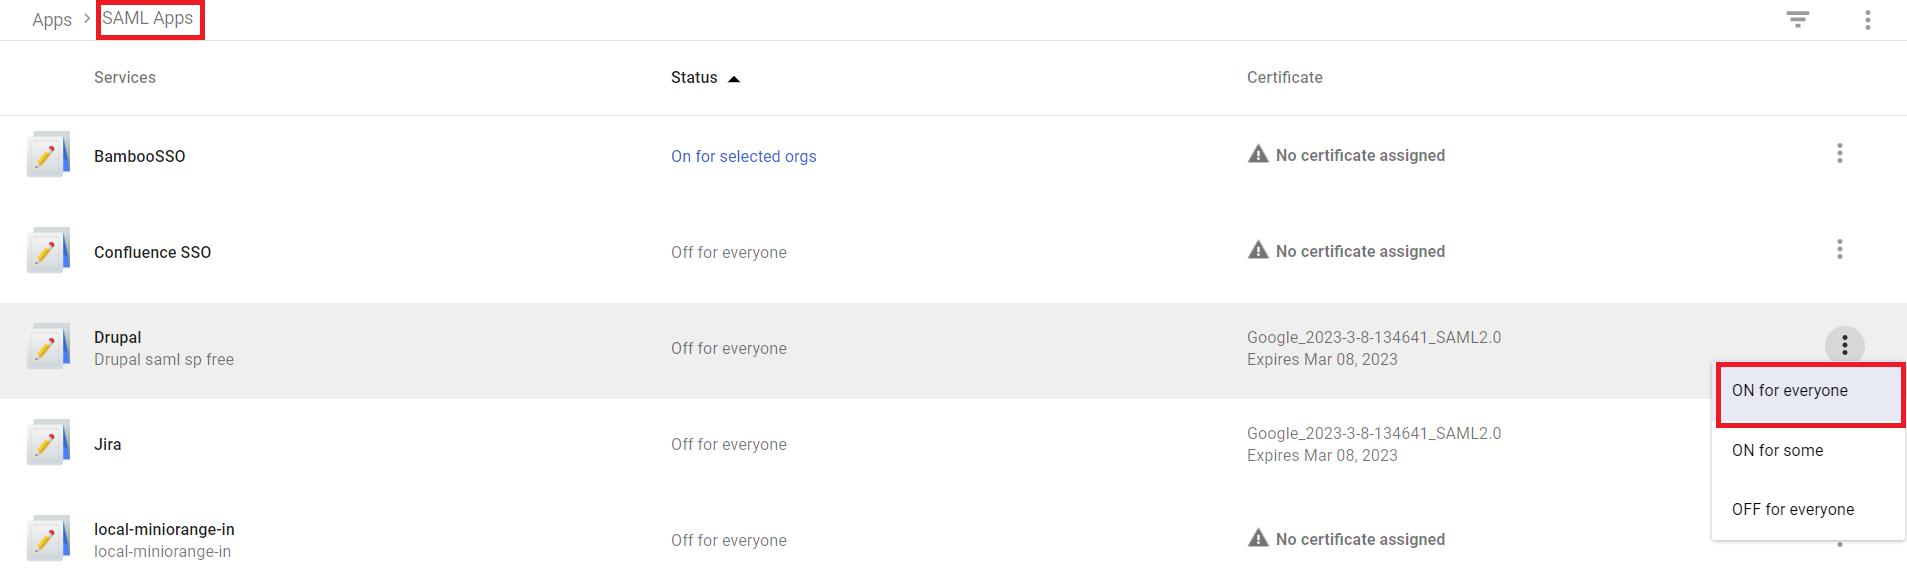 Google-apps idp